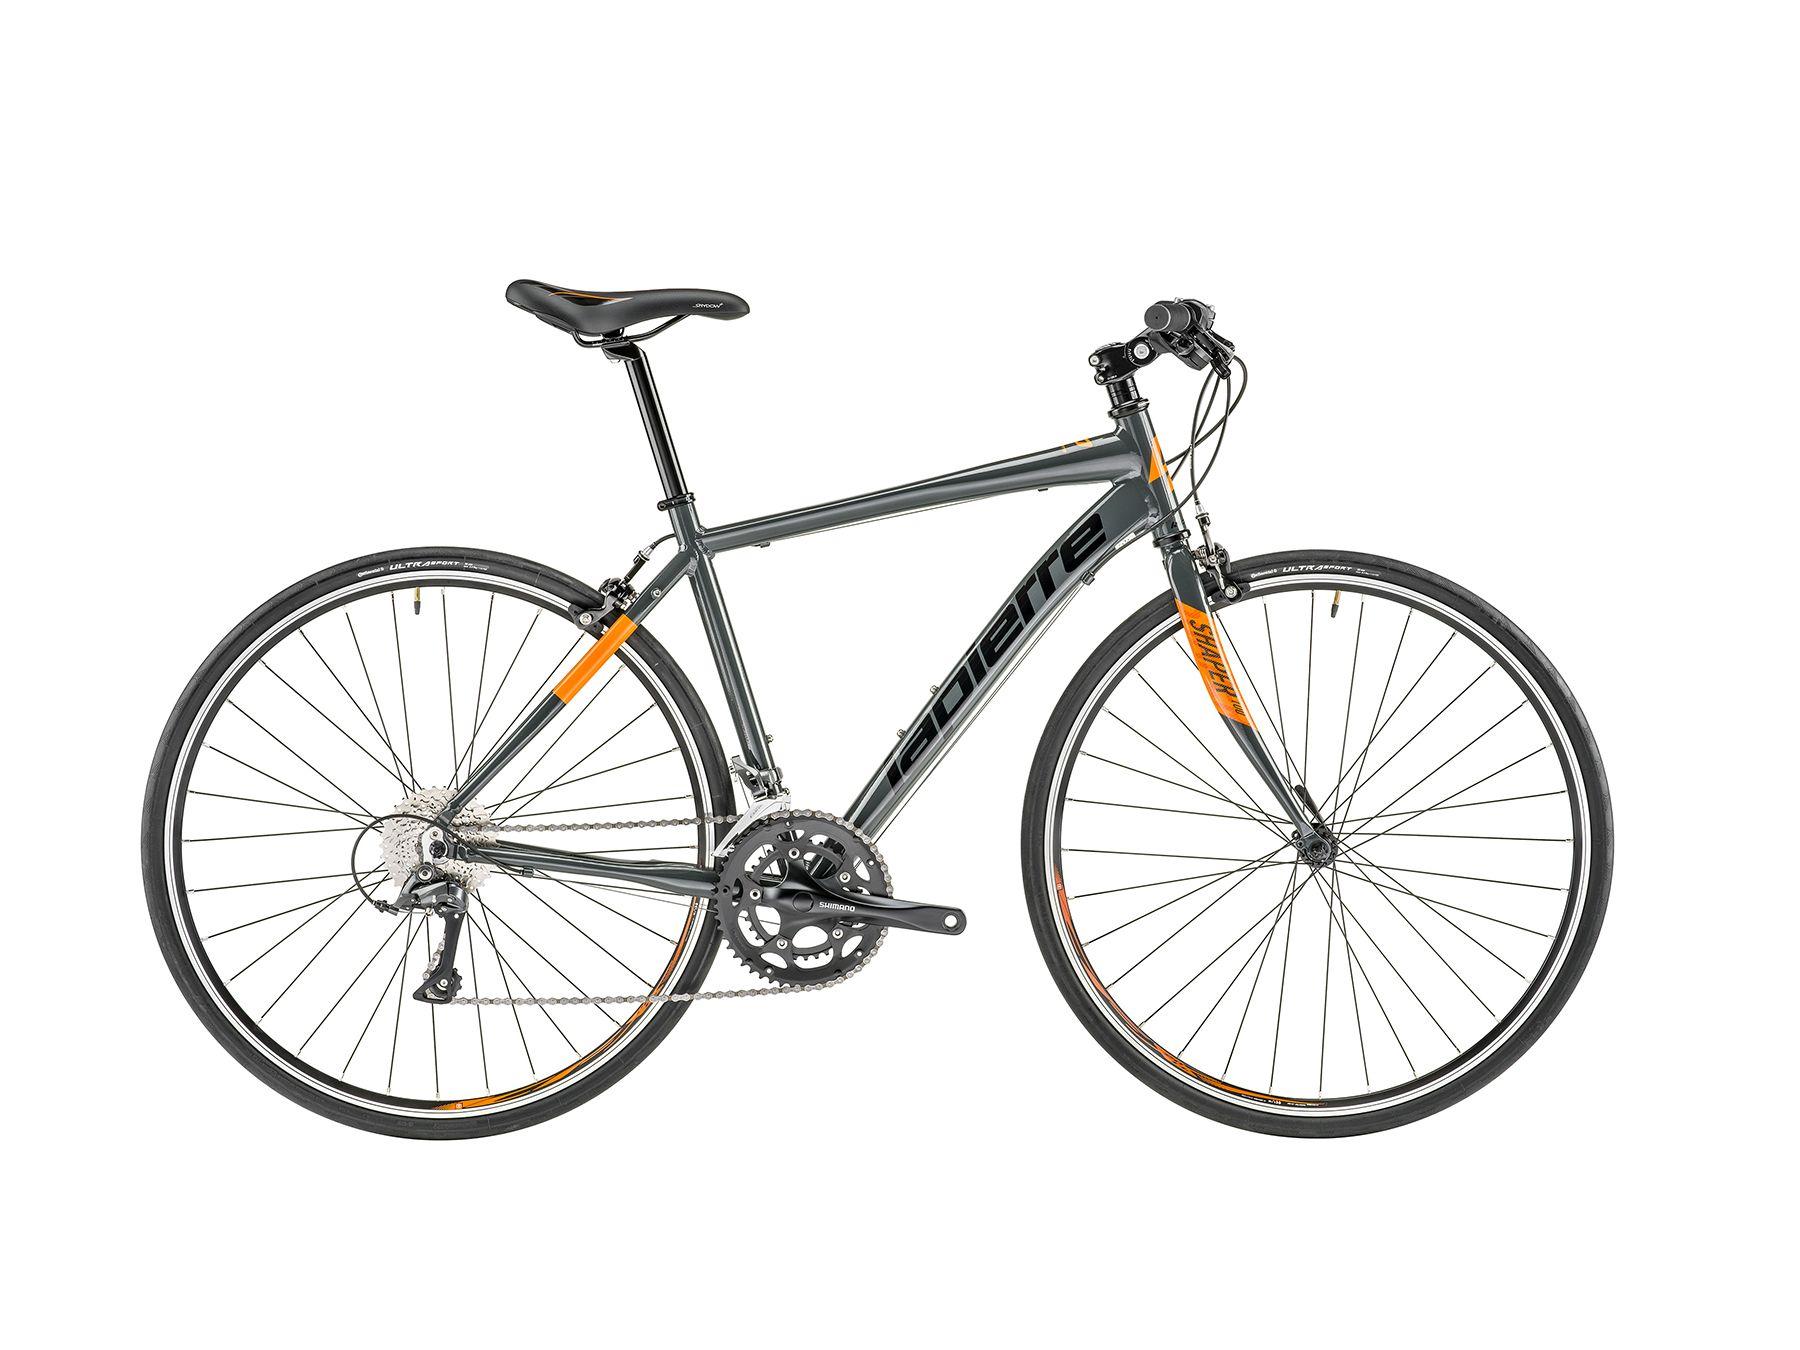 Lapierre Shaper 100 Bicicletta, Selle, Pneumatici